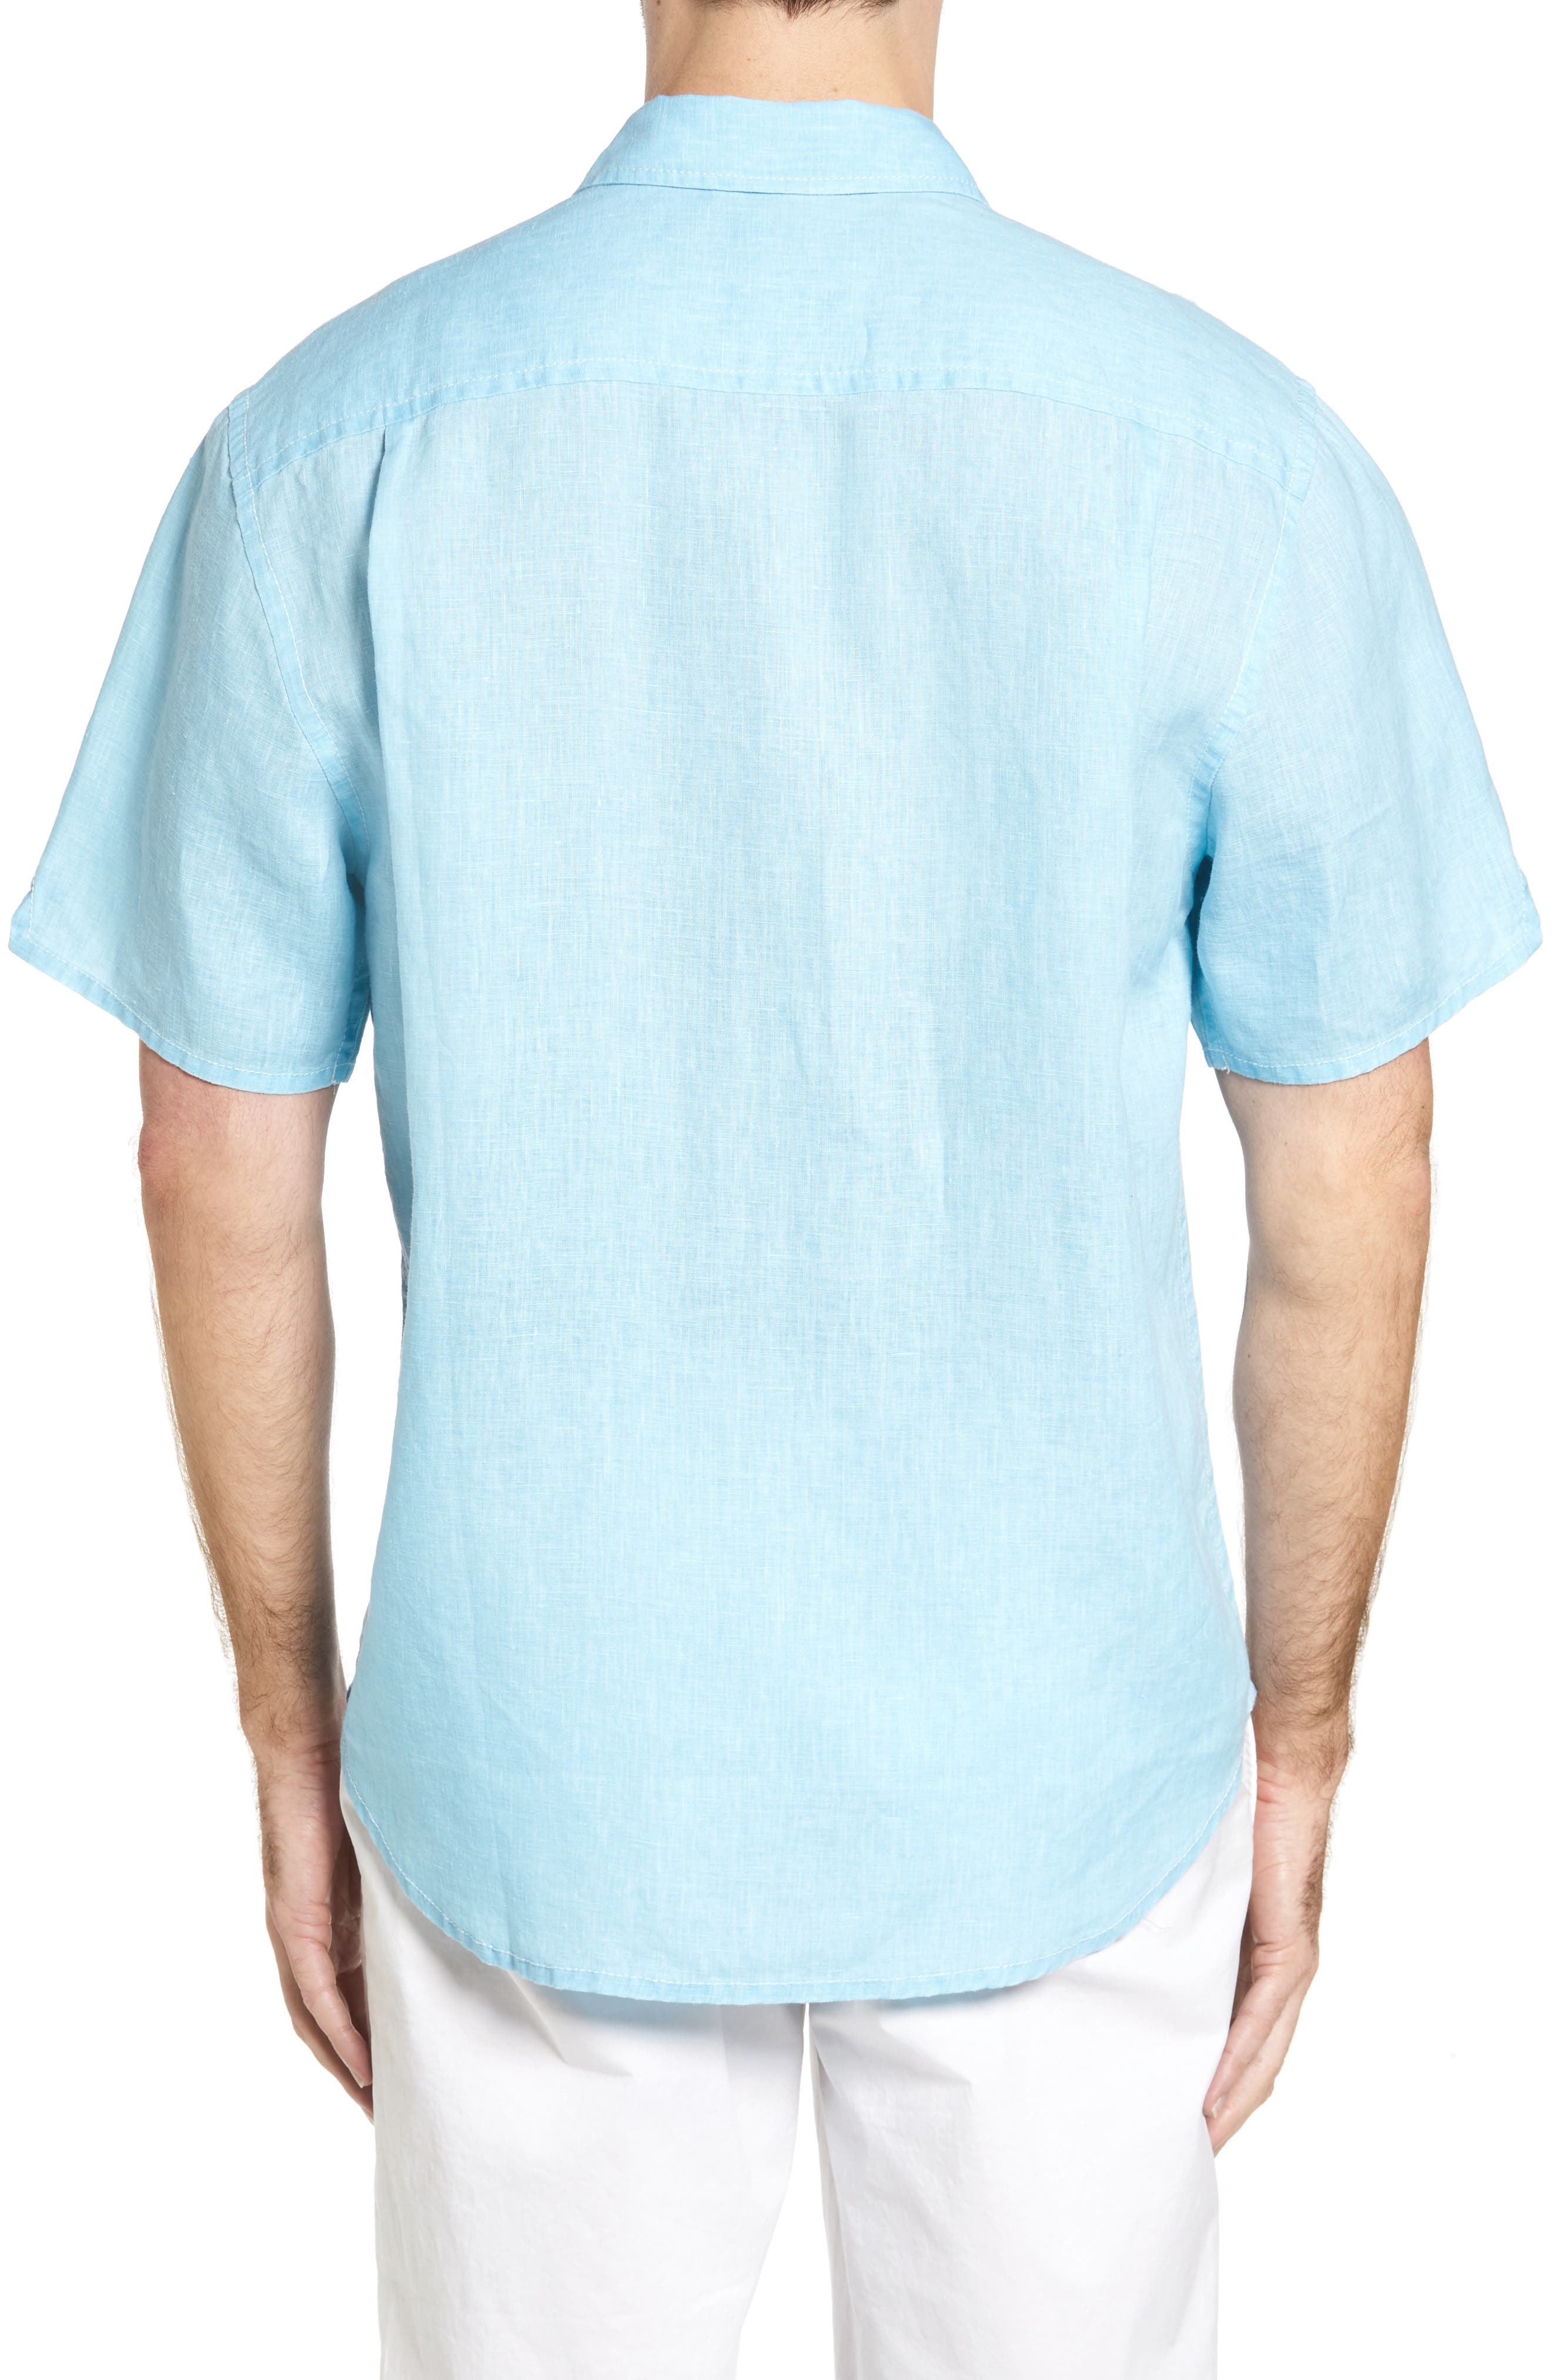 Alternate Image 2  - Tommy Bahama Seaglass Breezer Short Sleeve Linen Sport Shirt